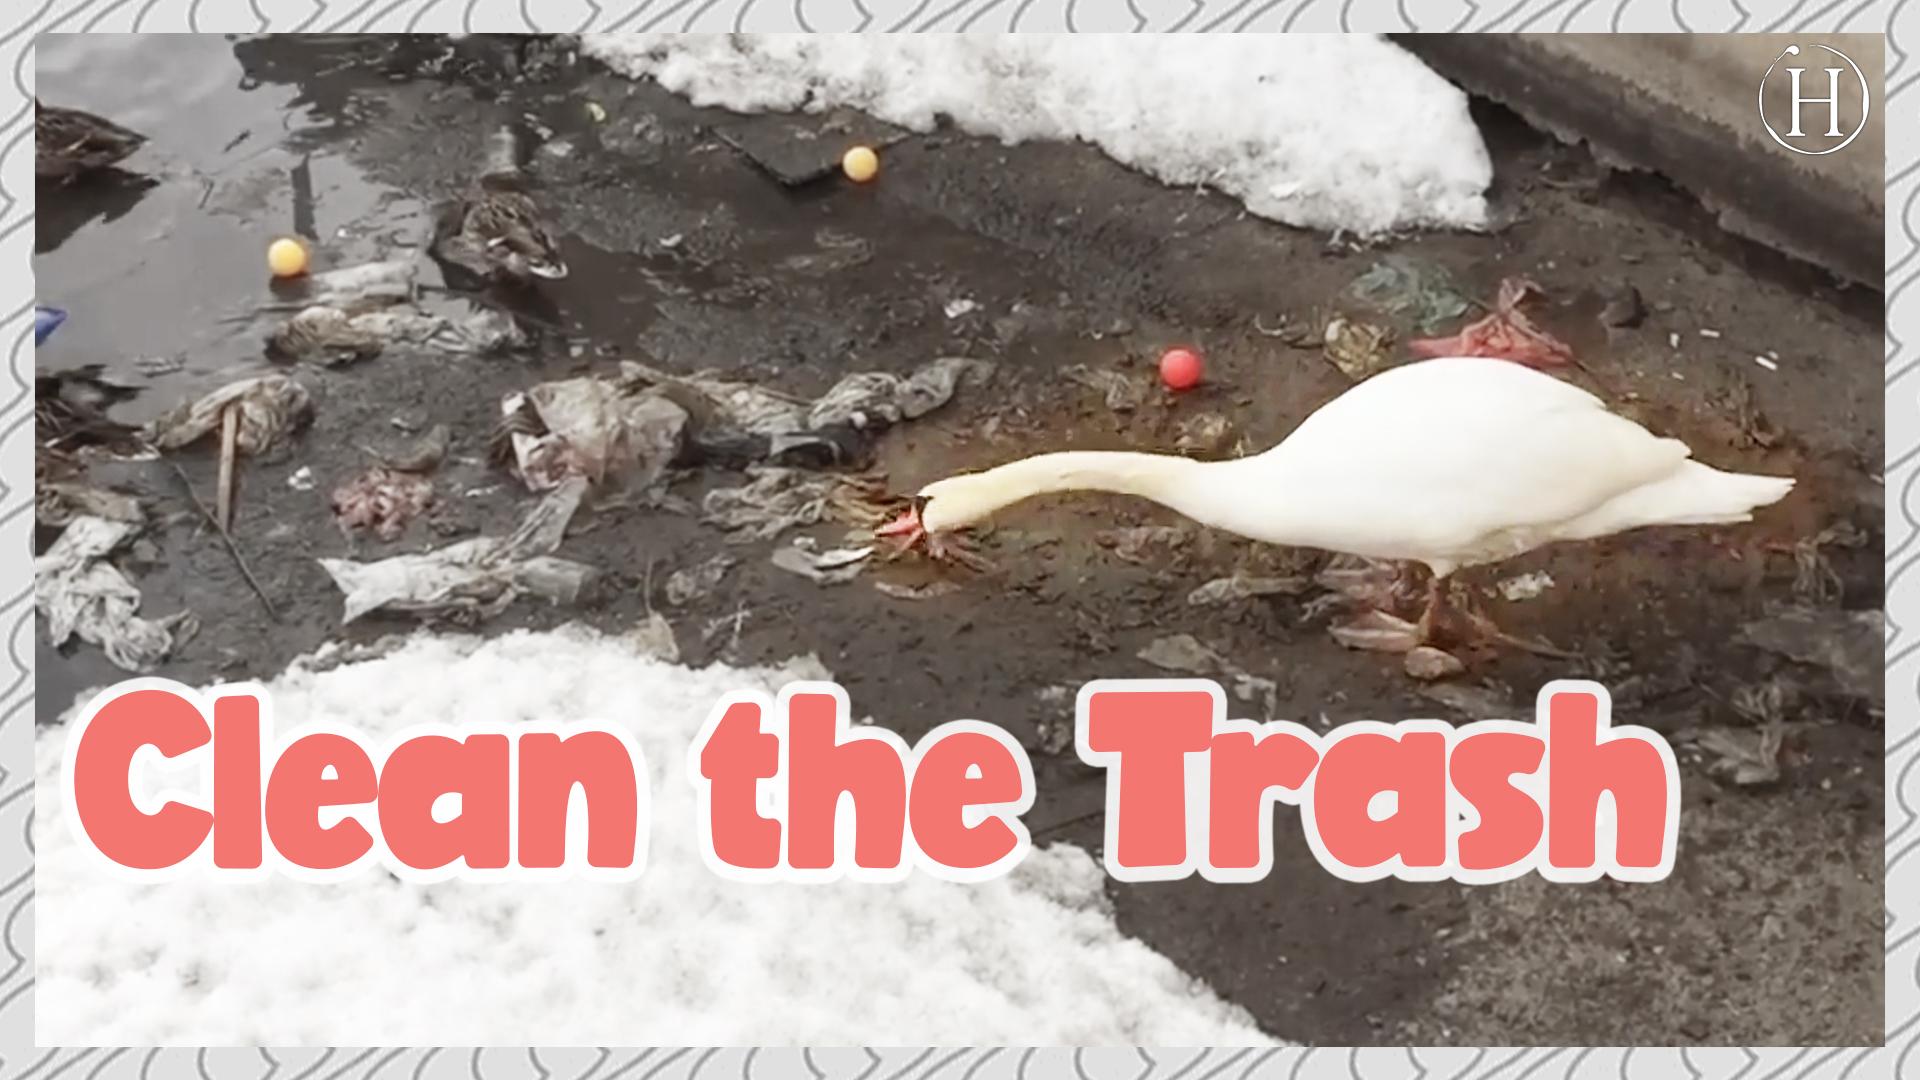 Swan Cleans Lake of Trash  | Humanity Life